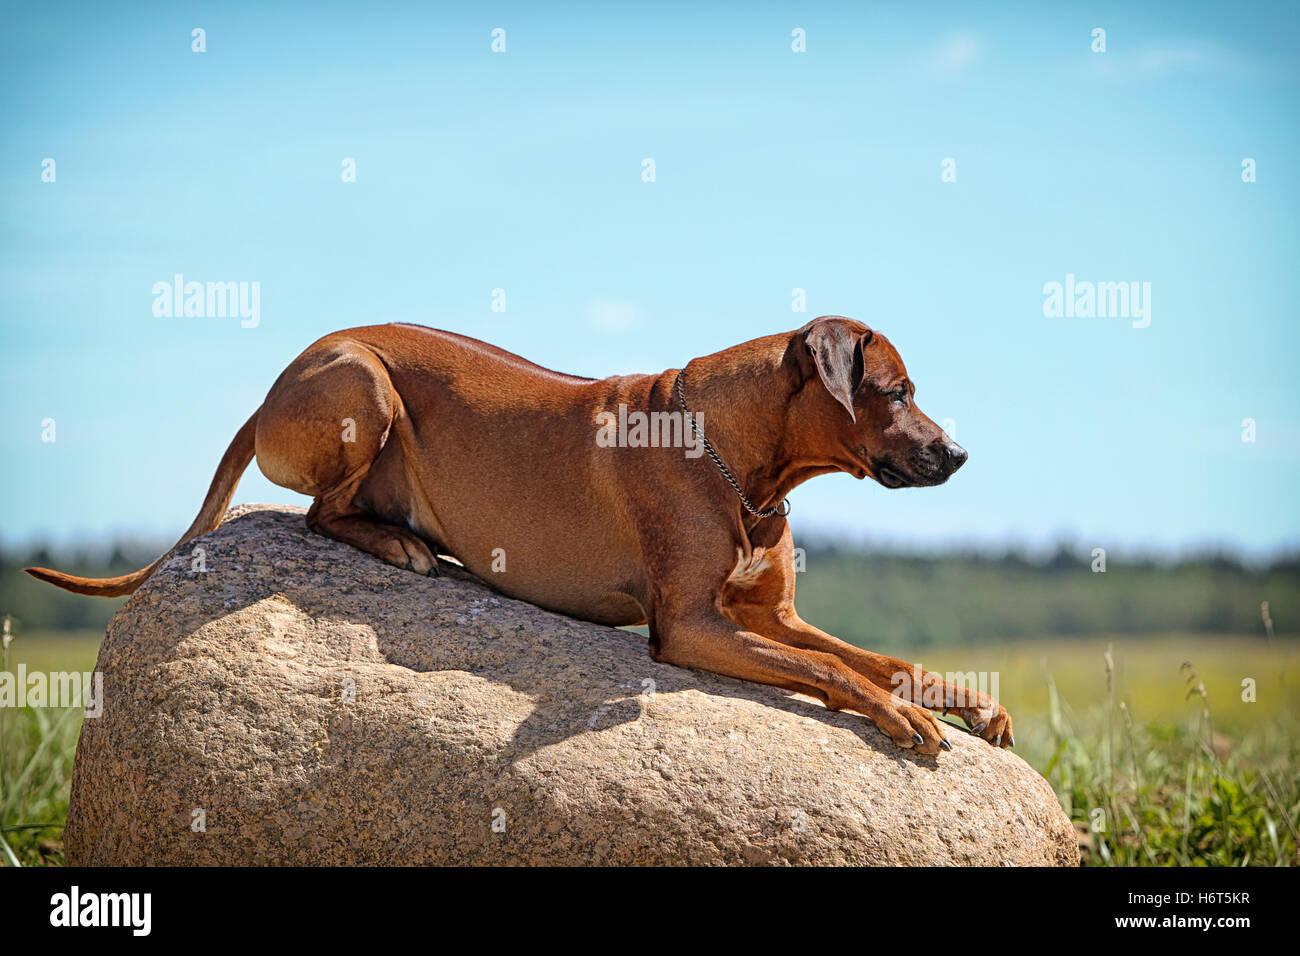 animal, pet, field, summer, summerly, sunlight, dog, firmament, sky, meadow, - Stock Image